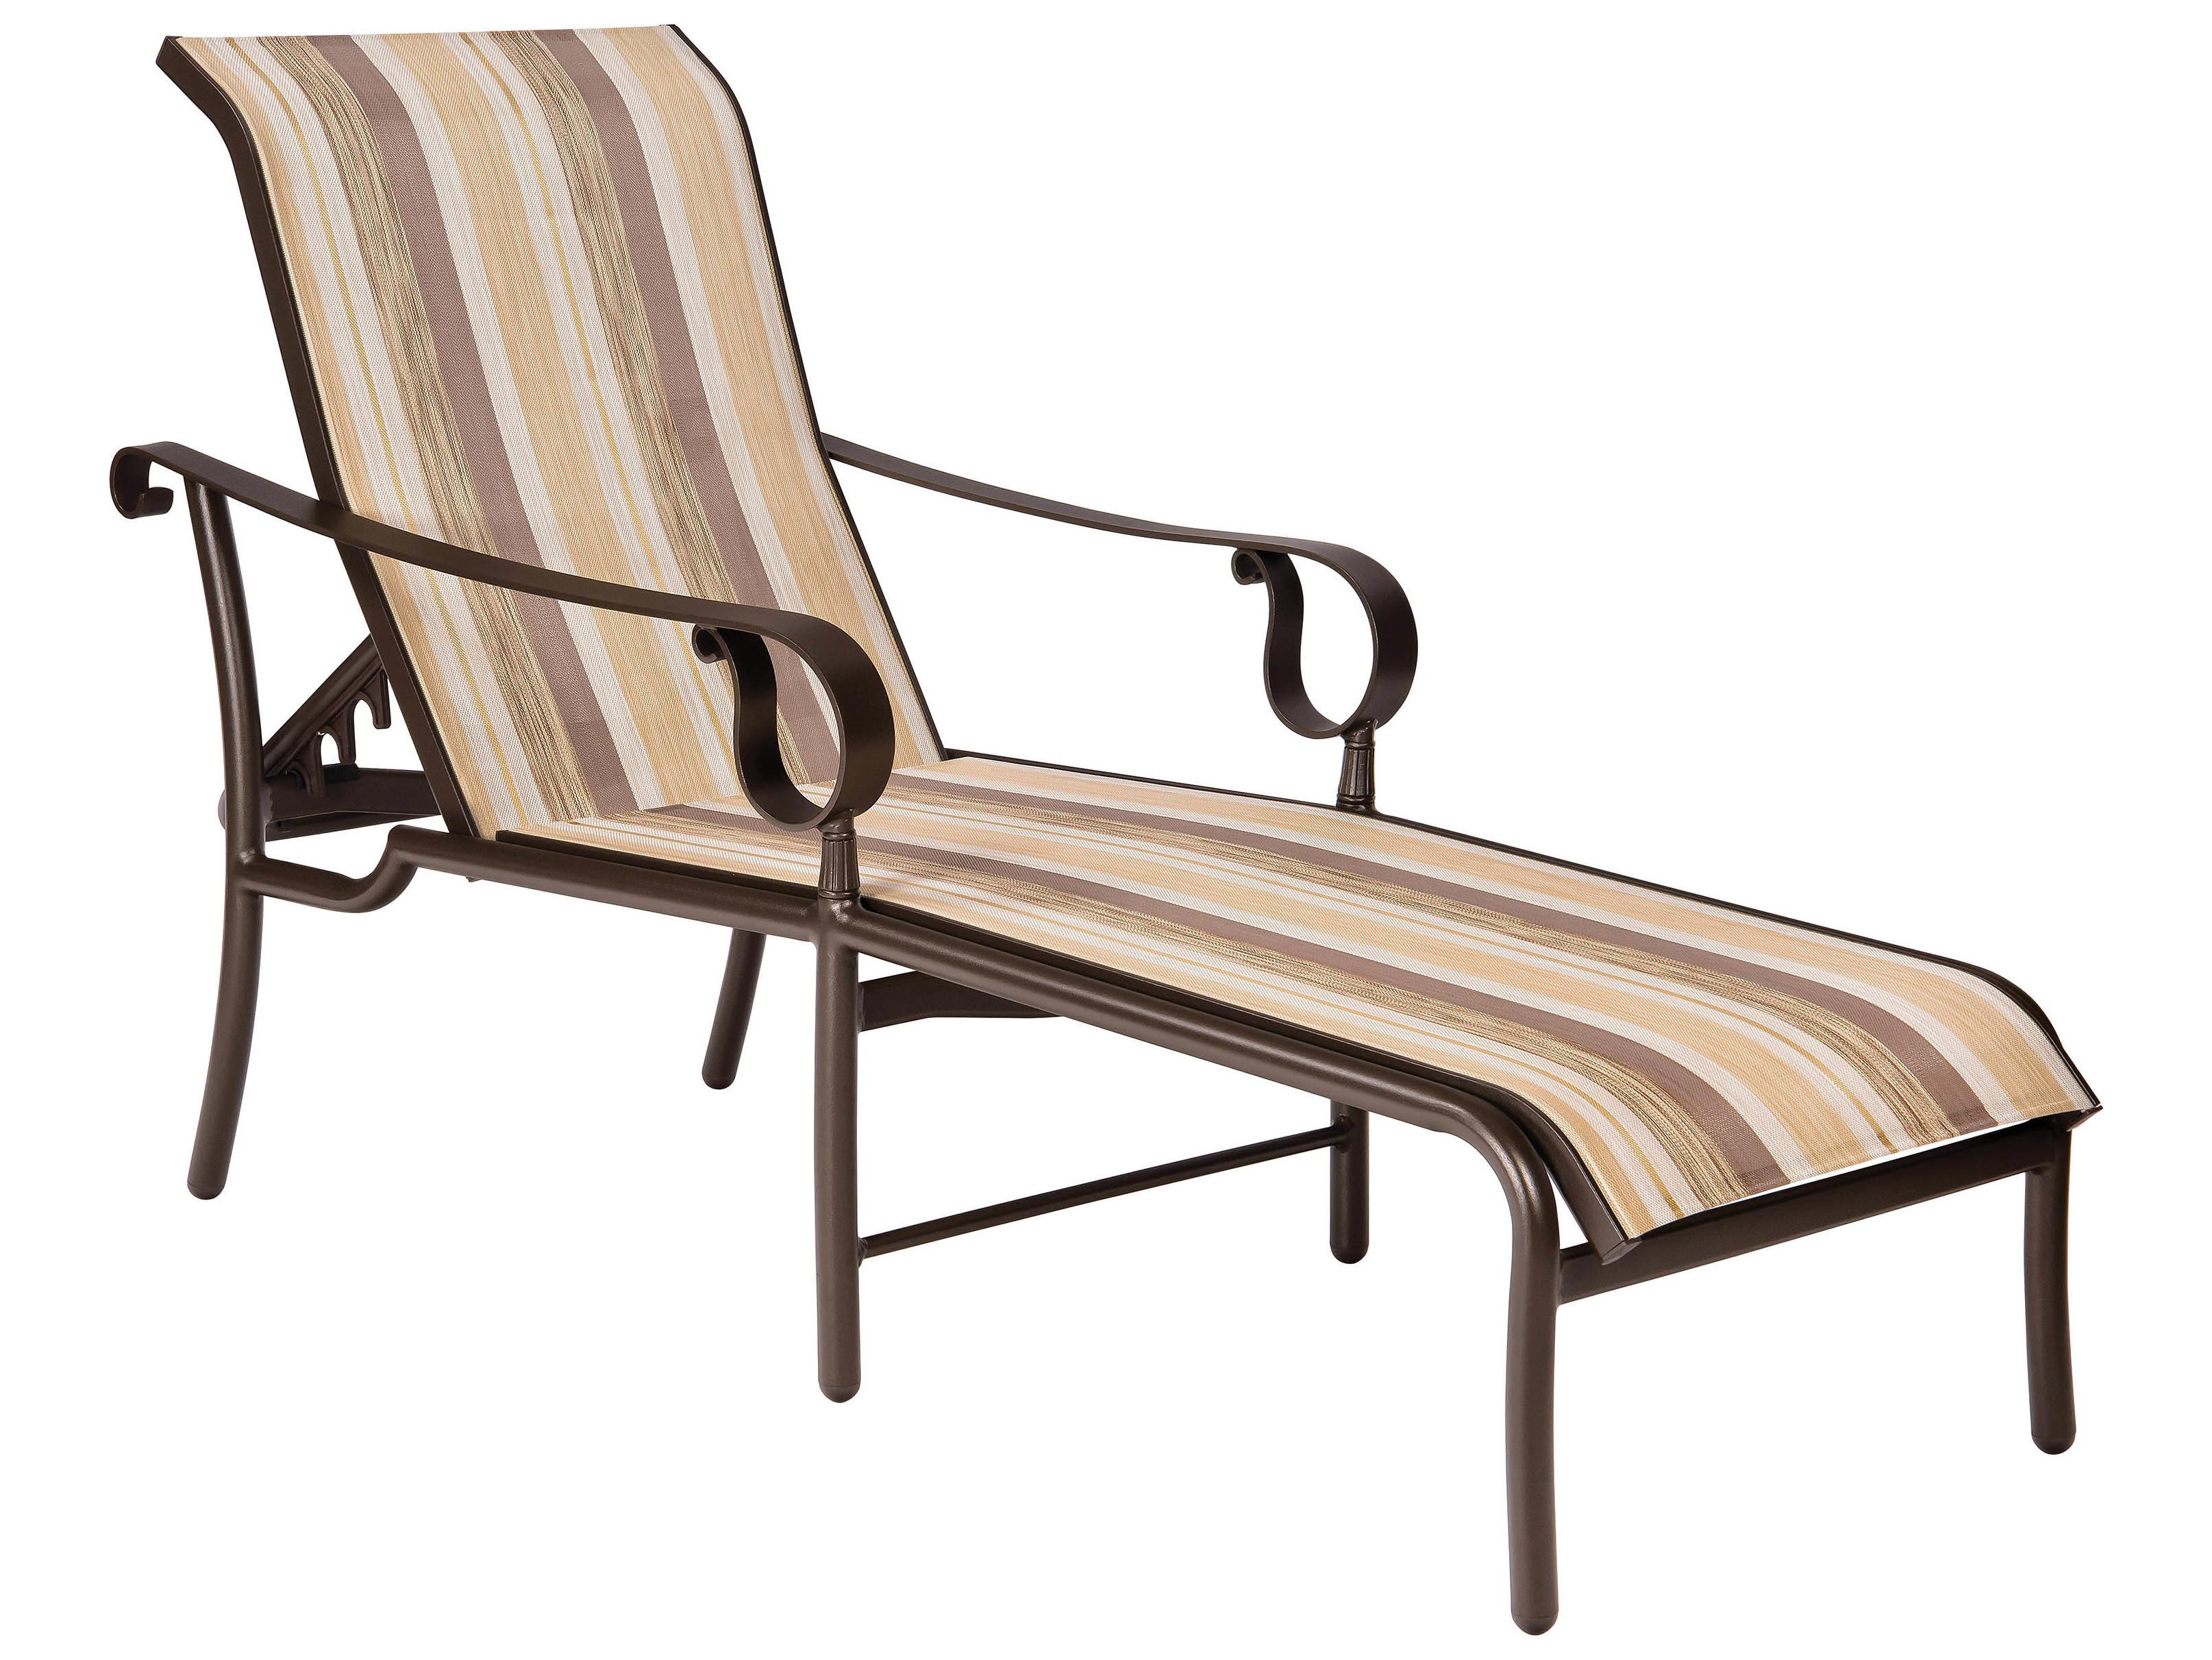 Woodard ridgecrest sling aluminum adjustable chaise lounge for Aluminum sling chaise lounge